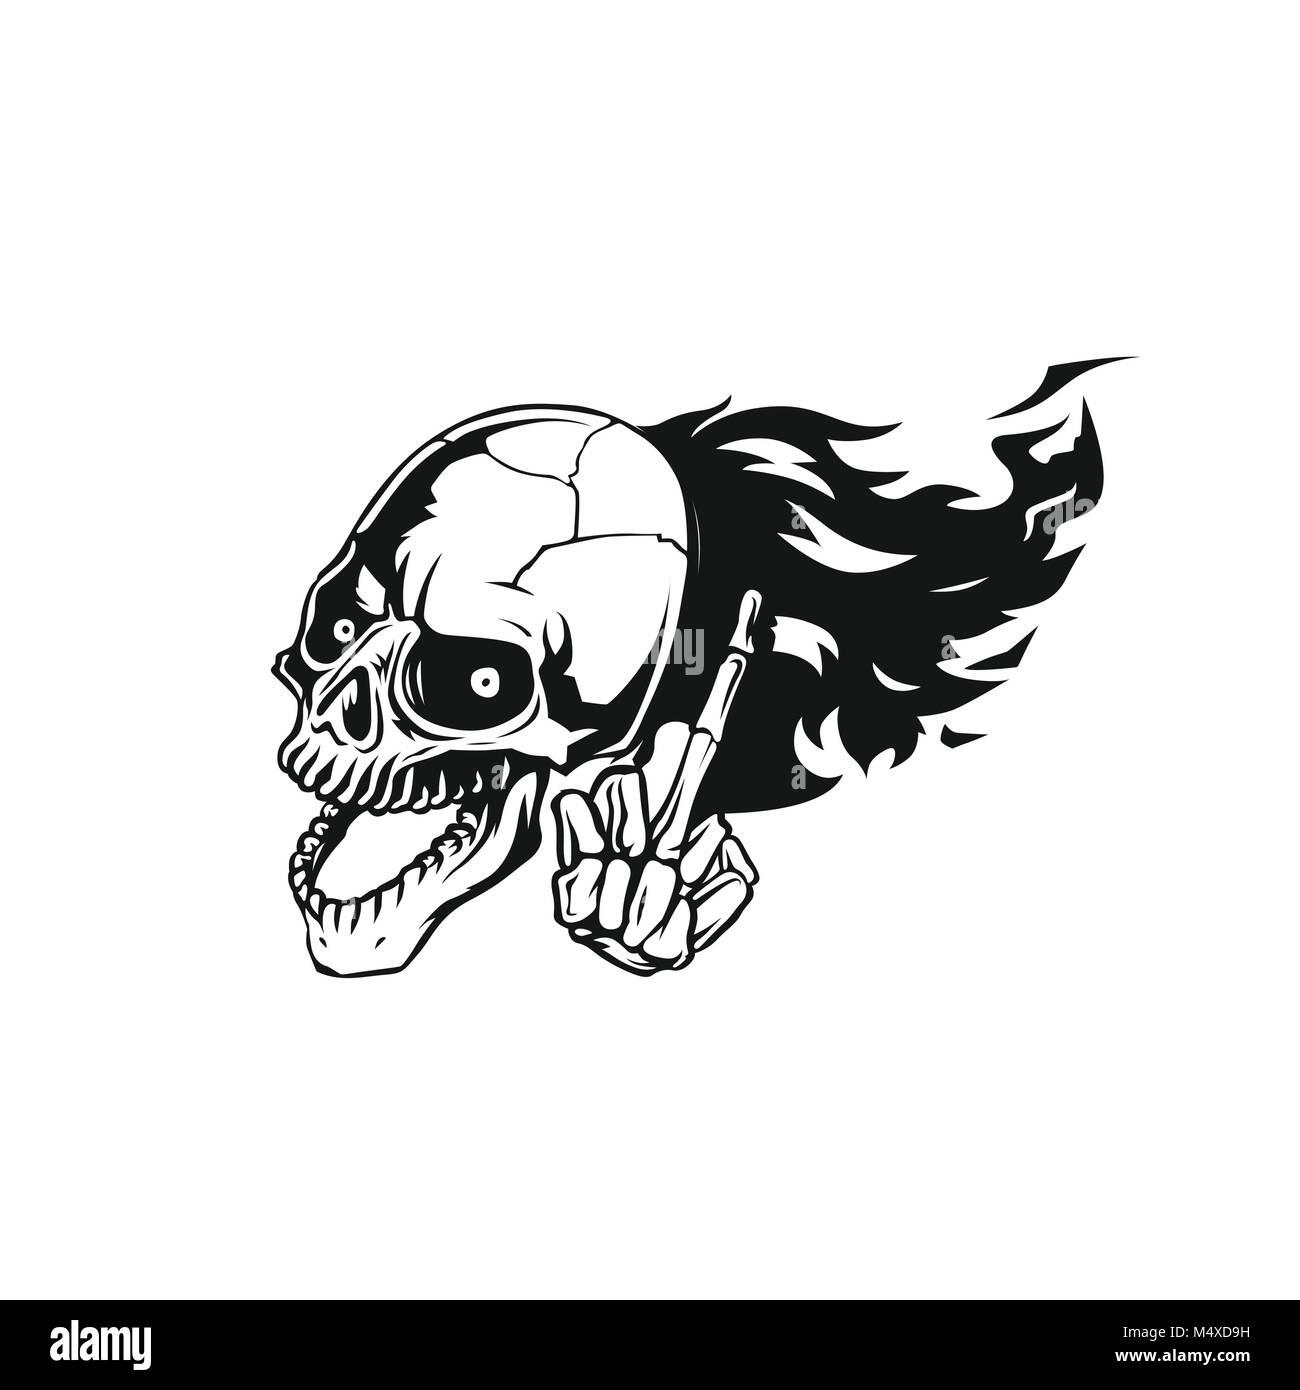 skull flying logo vector illustration. - Stock Image